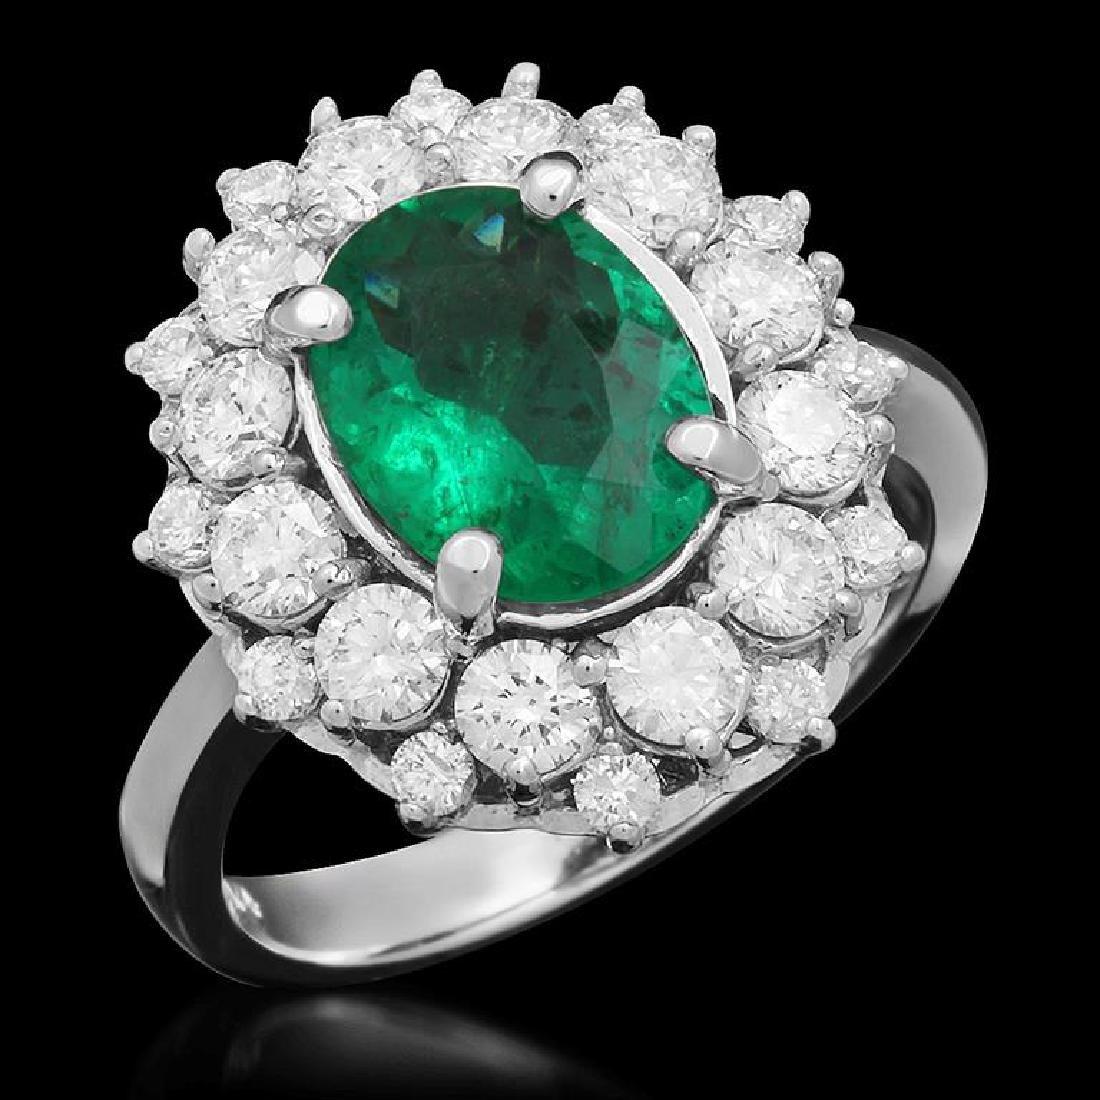 14K Gold 1.65ct Emerald 1.43ct Diamond Ring